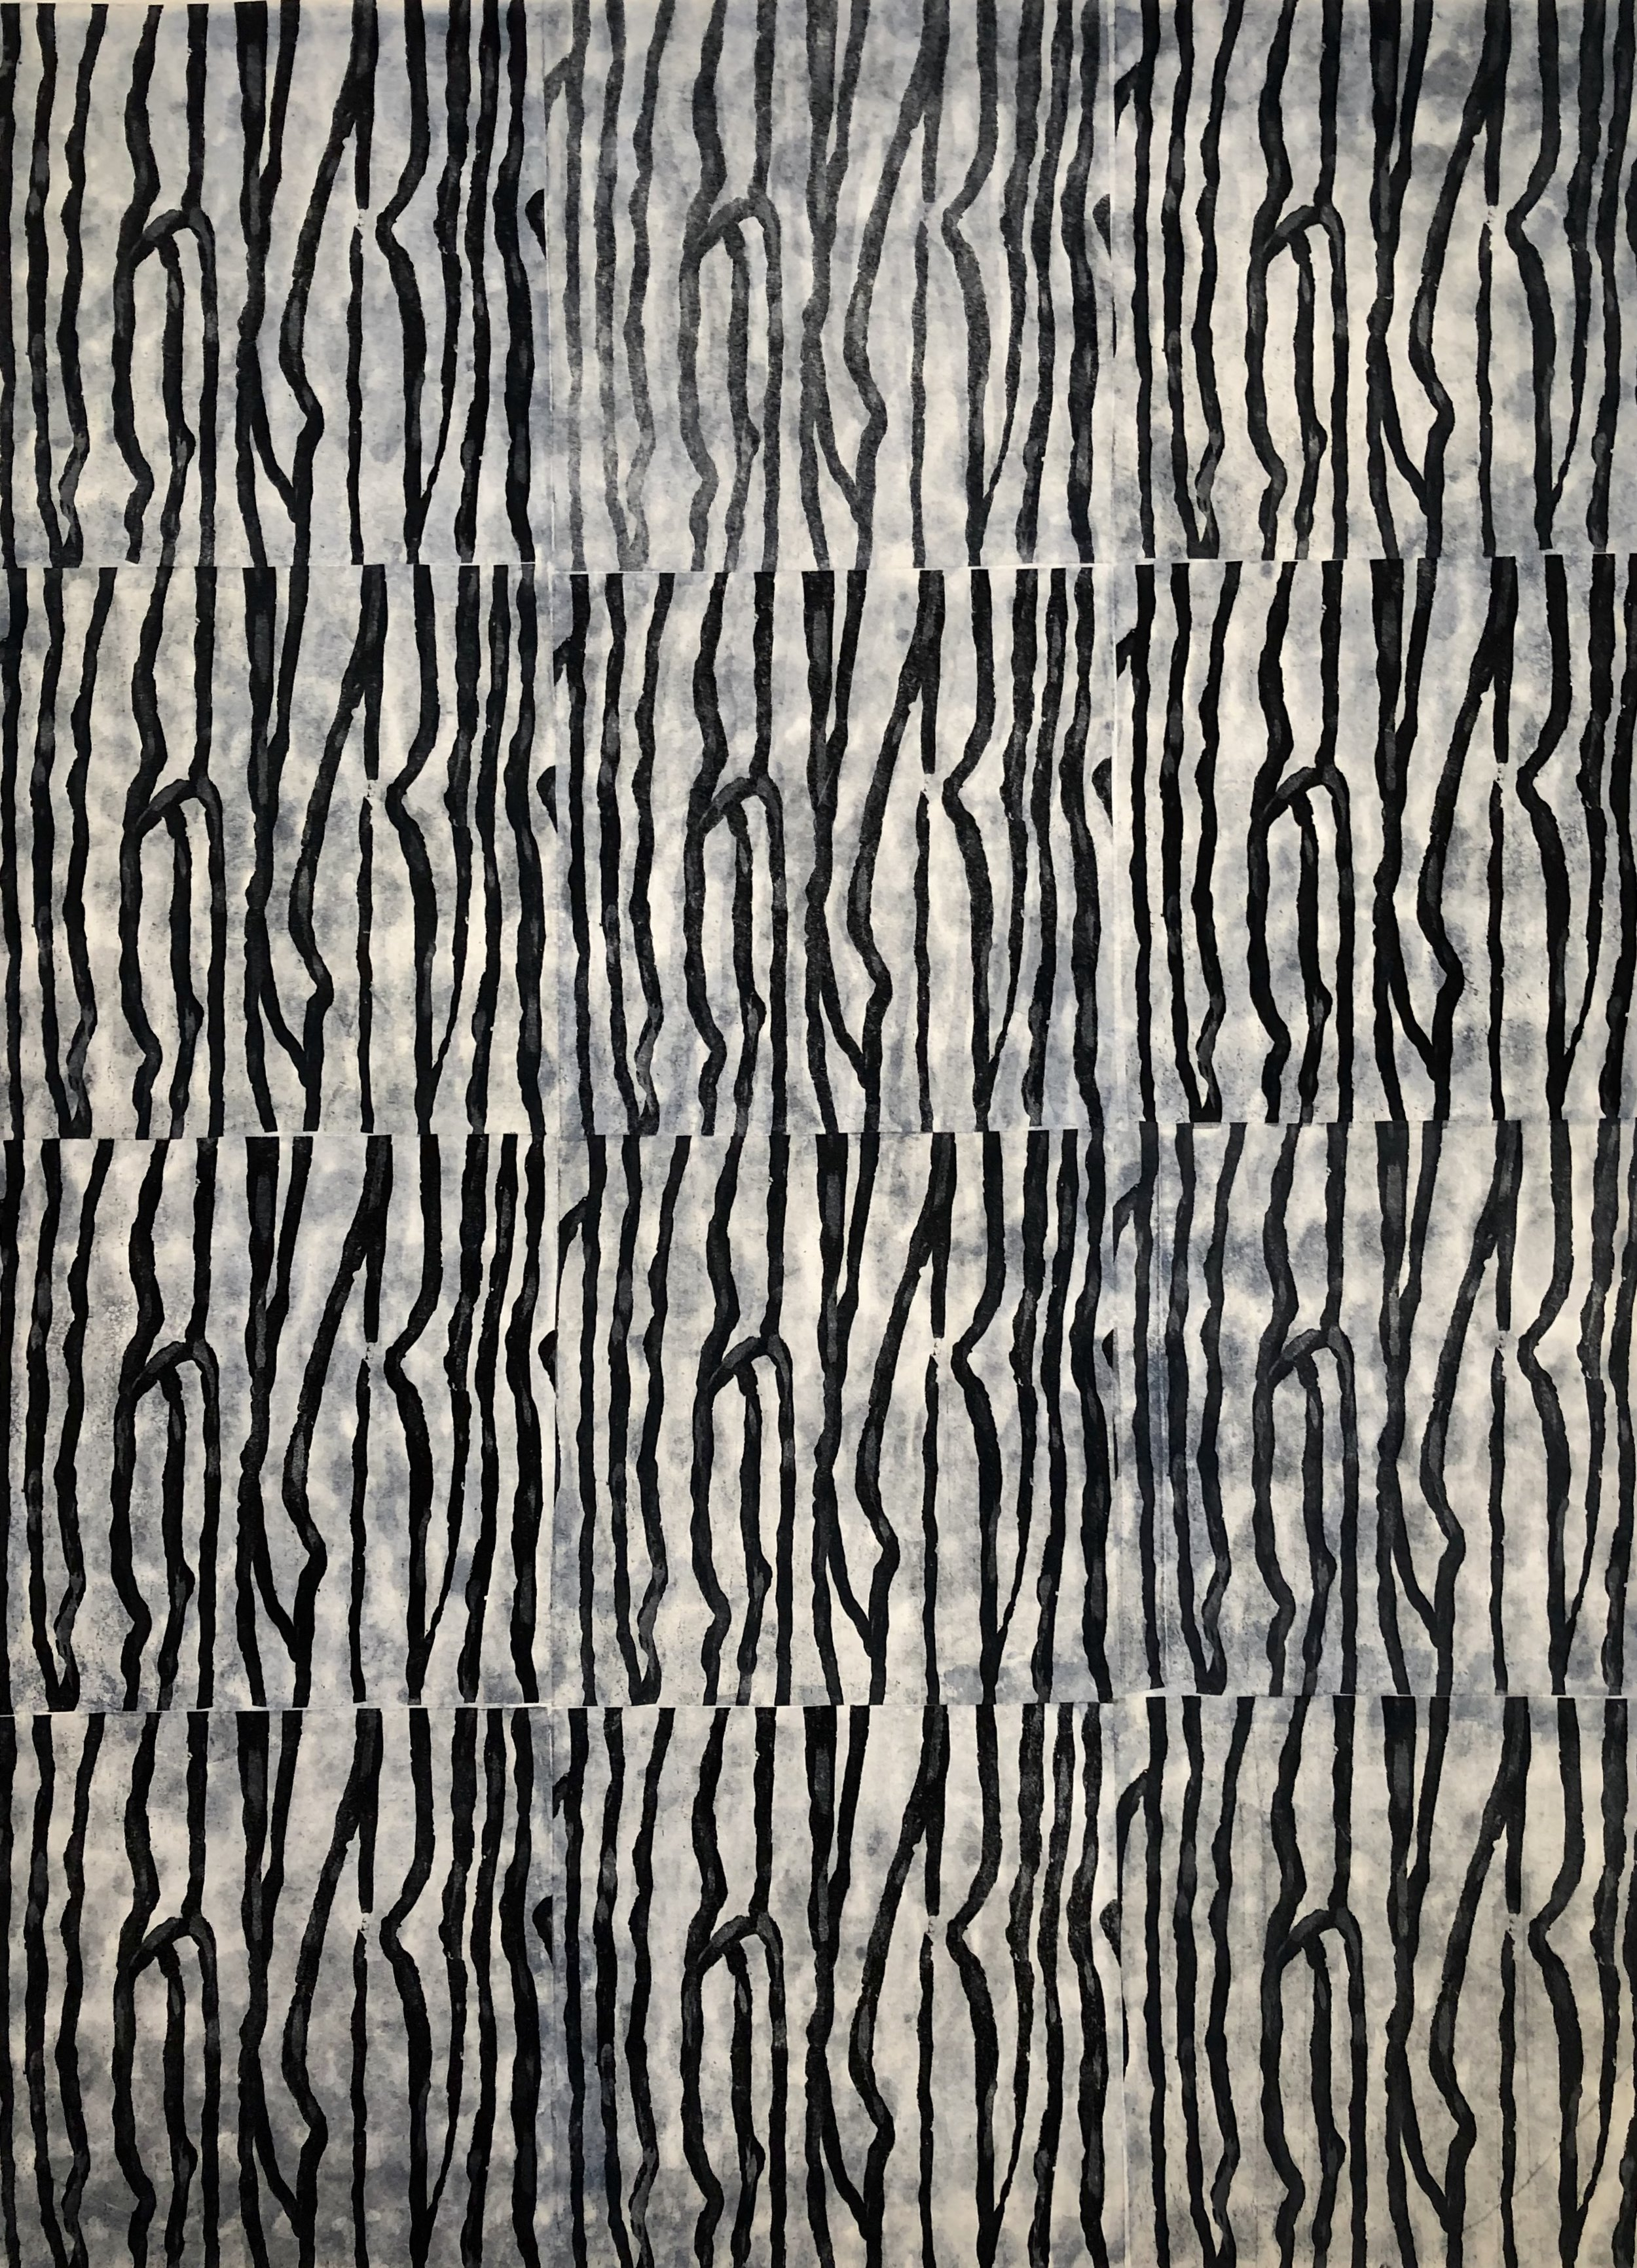 Sashiko 4 2018 | intaglio, thread | 18x24